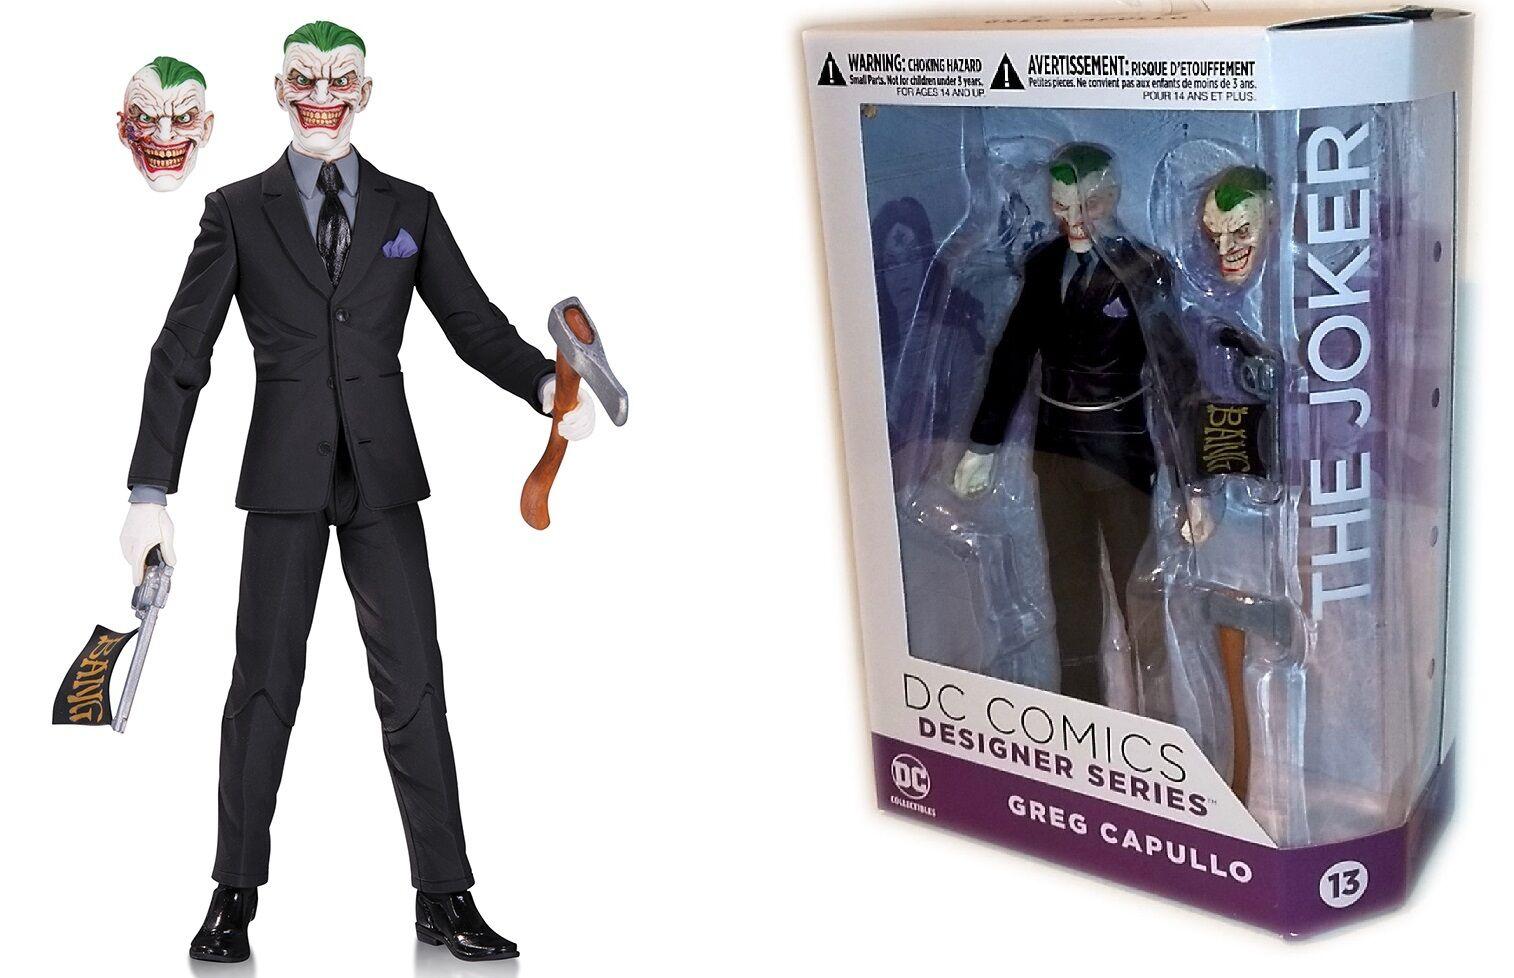 Dc collectibles batman joker designer greg capullo serie